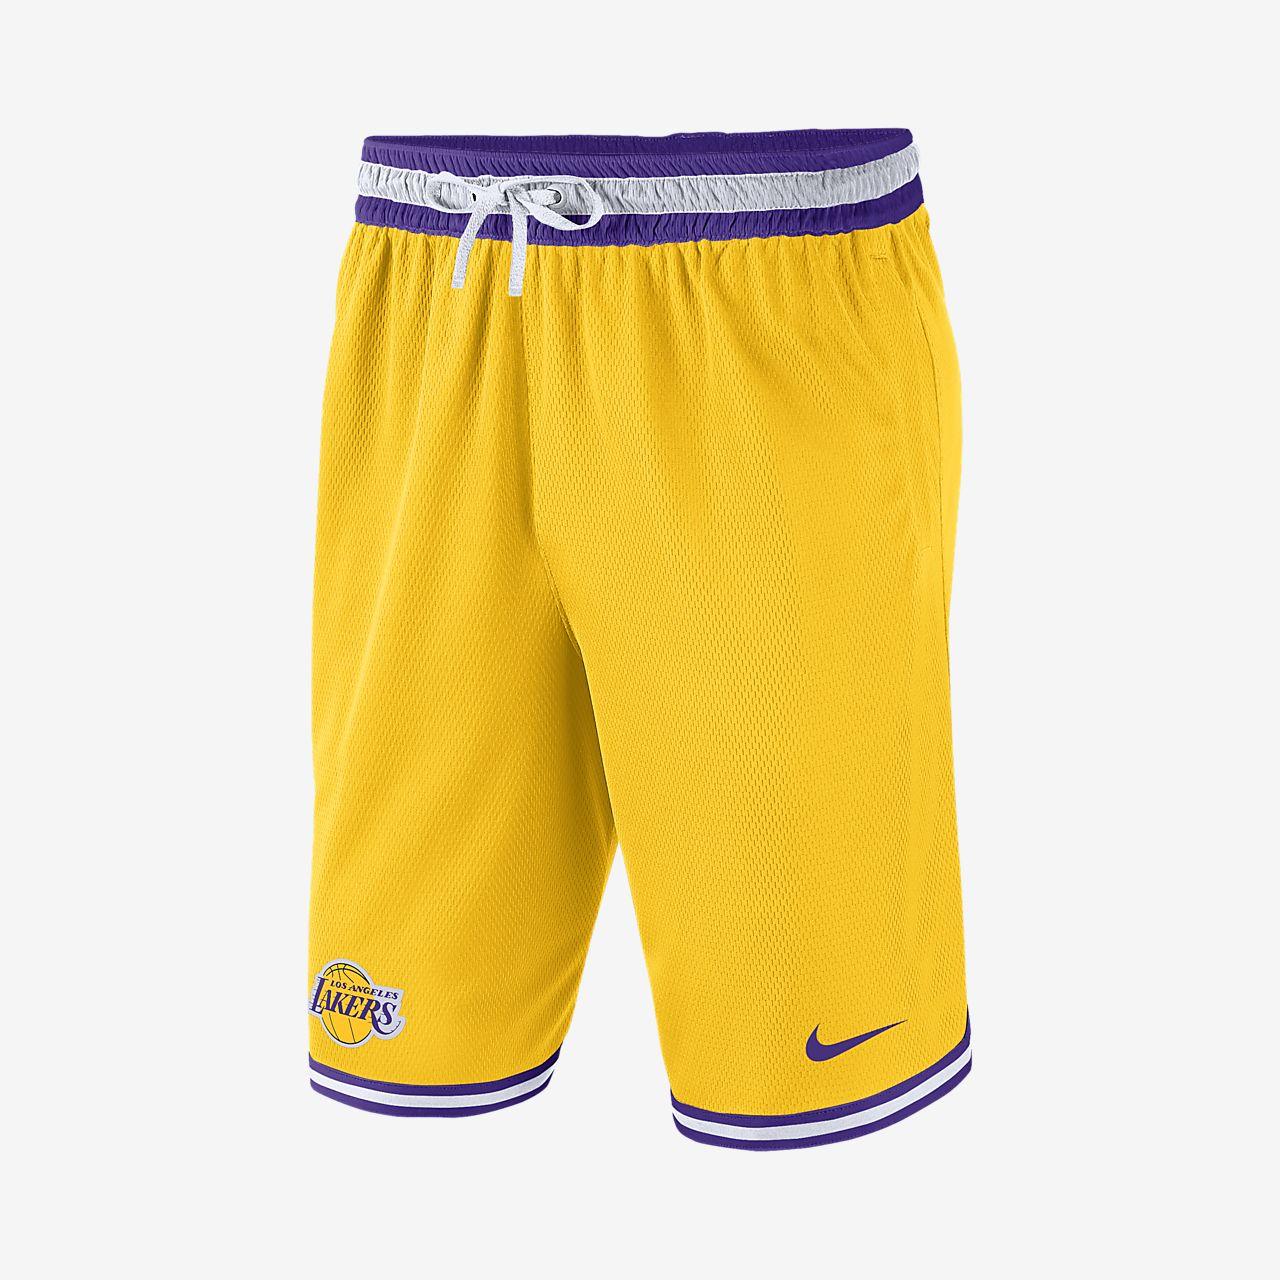 Shorts de la NBA para hombre Los Angeles Lakers Nike